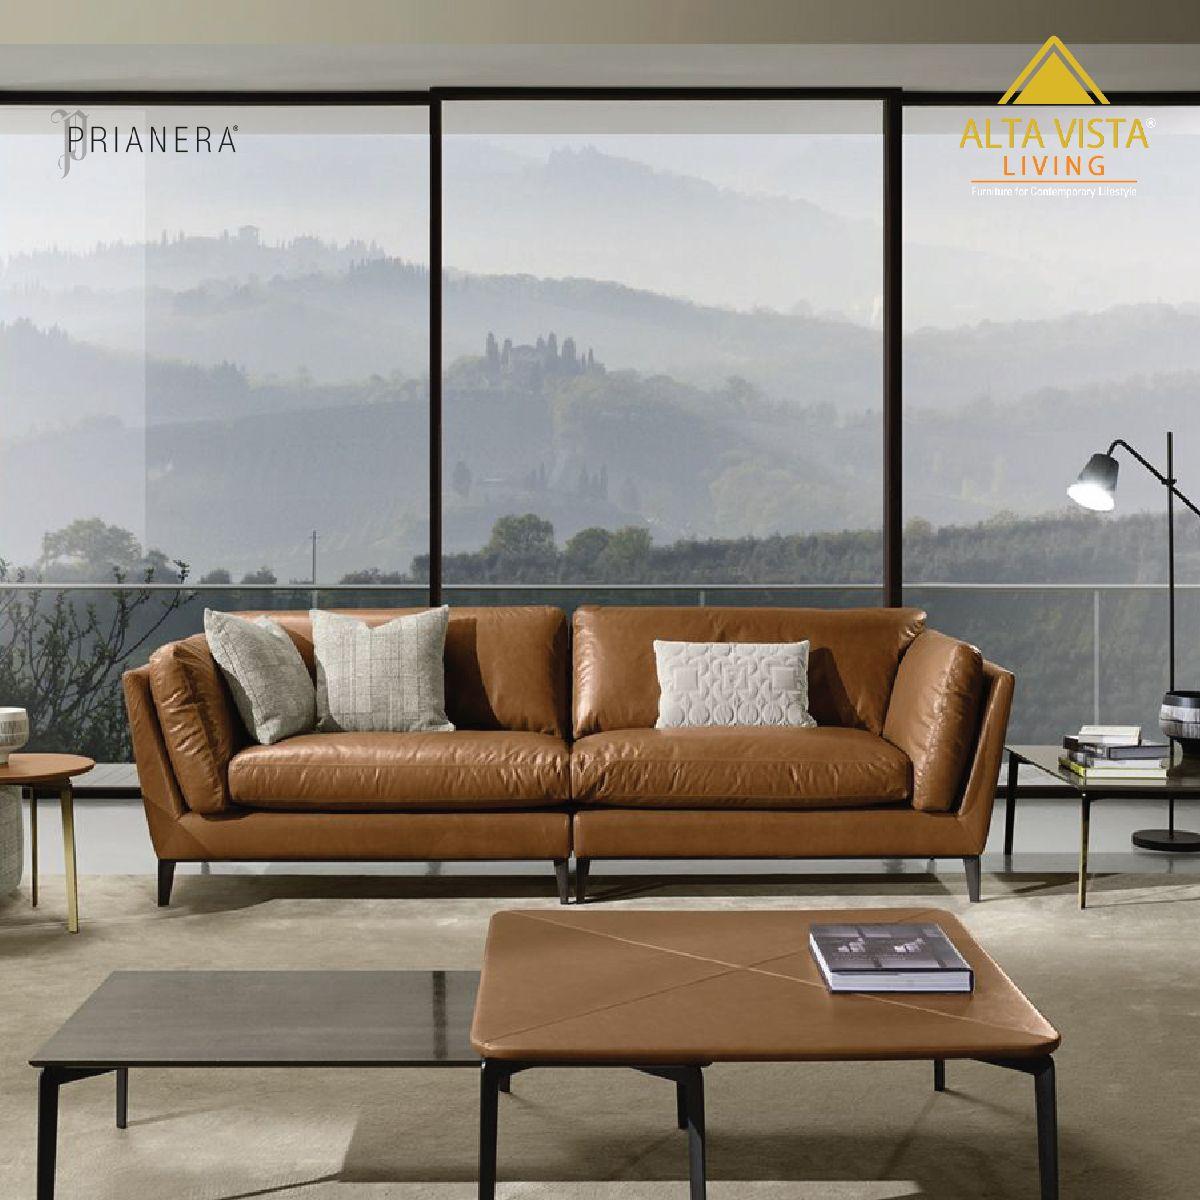 Living Room Designs By Prianera At Alta Vista Scandinavian Sofas Apartment Interior Design Living Room Designs